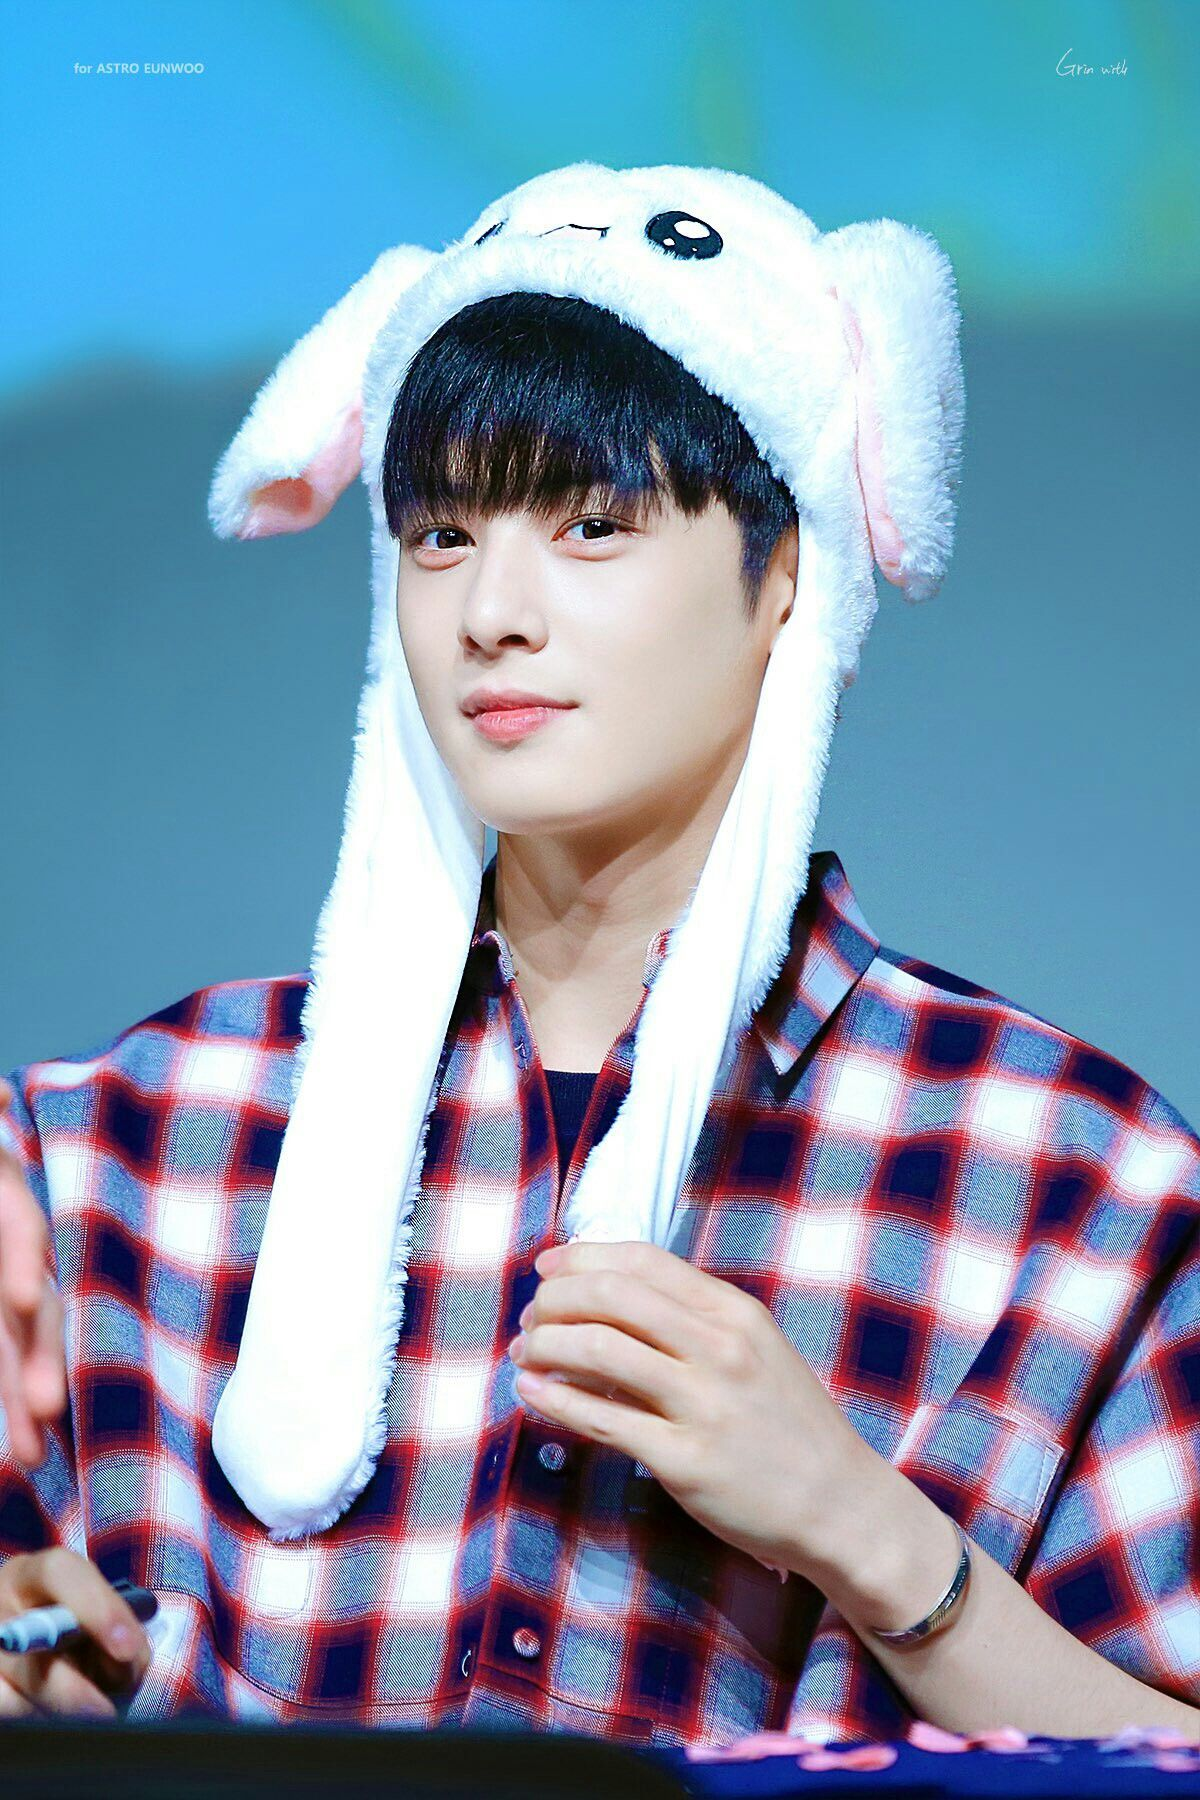 Cute Bunny Astro Eunwoo Photo C Twitter Com Grin With Ew